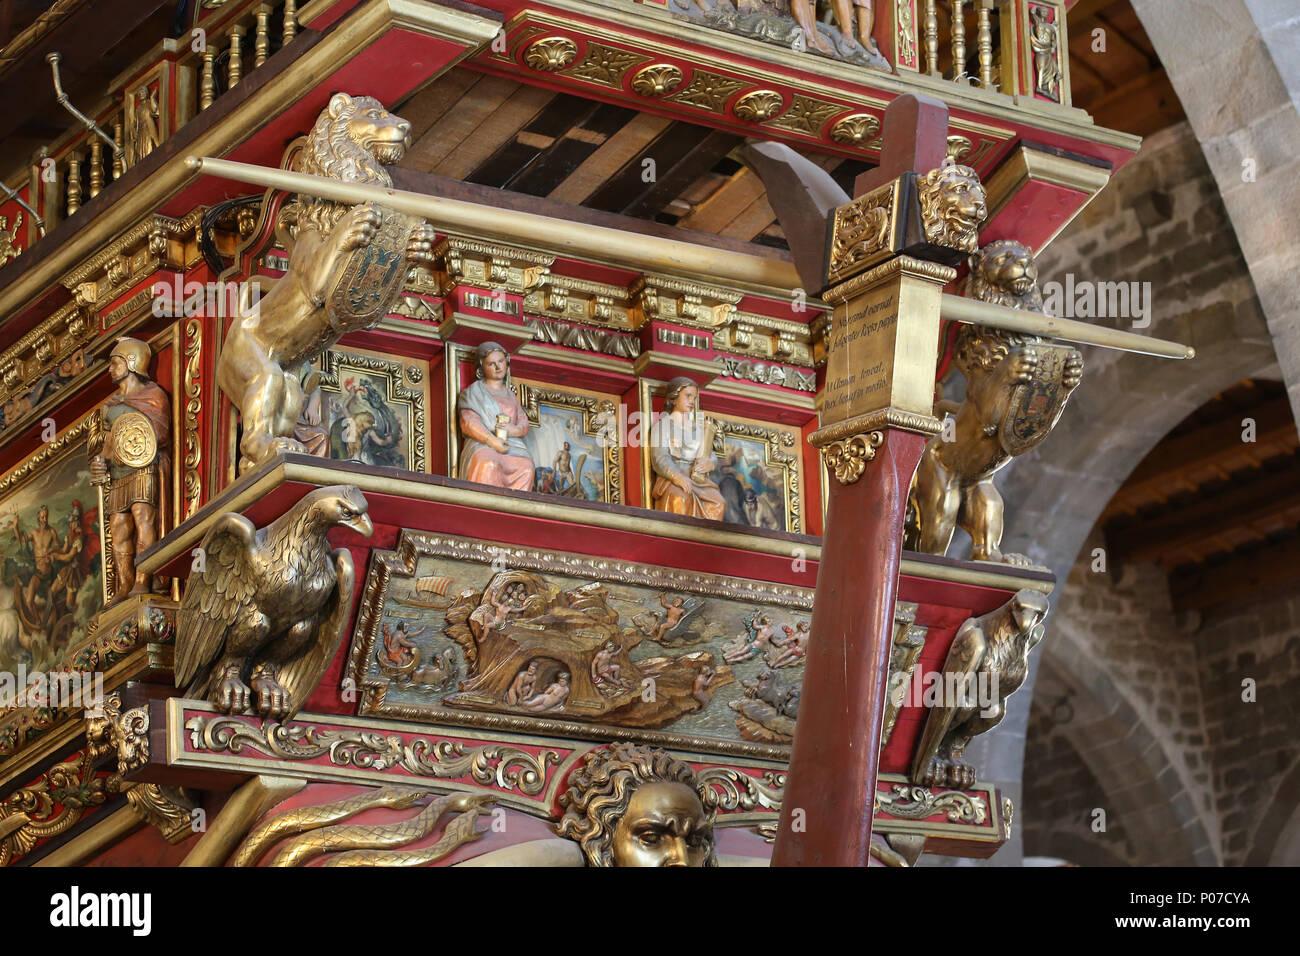 Kombüse Real, Don Juans Flaggschiff in der Schlacht von Lepanto (1571). Stern. Barcelona Maritime Museum. Spanien. Stockbild